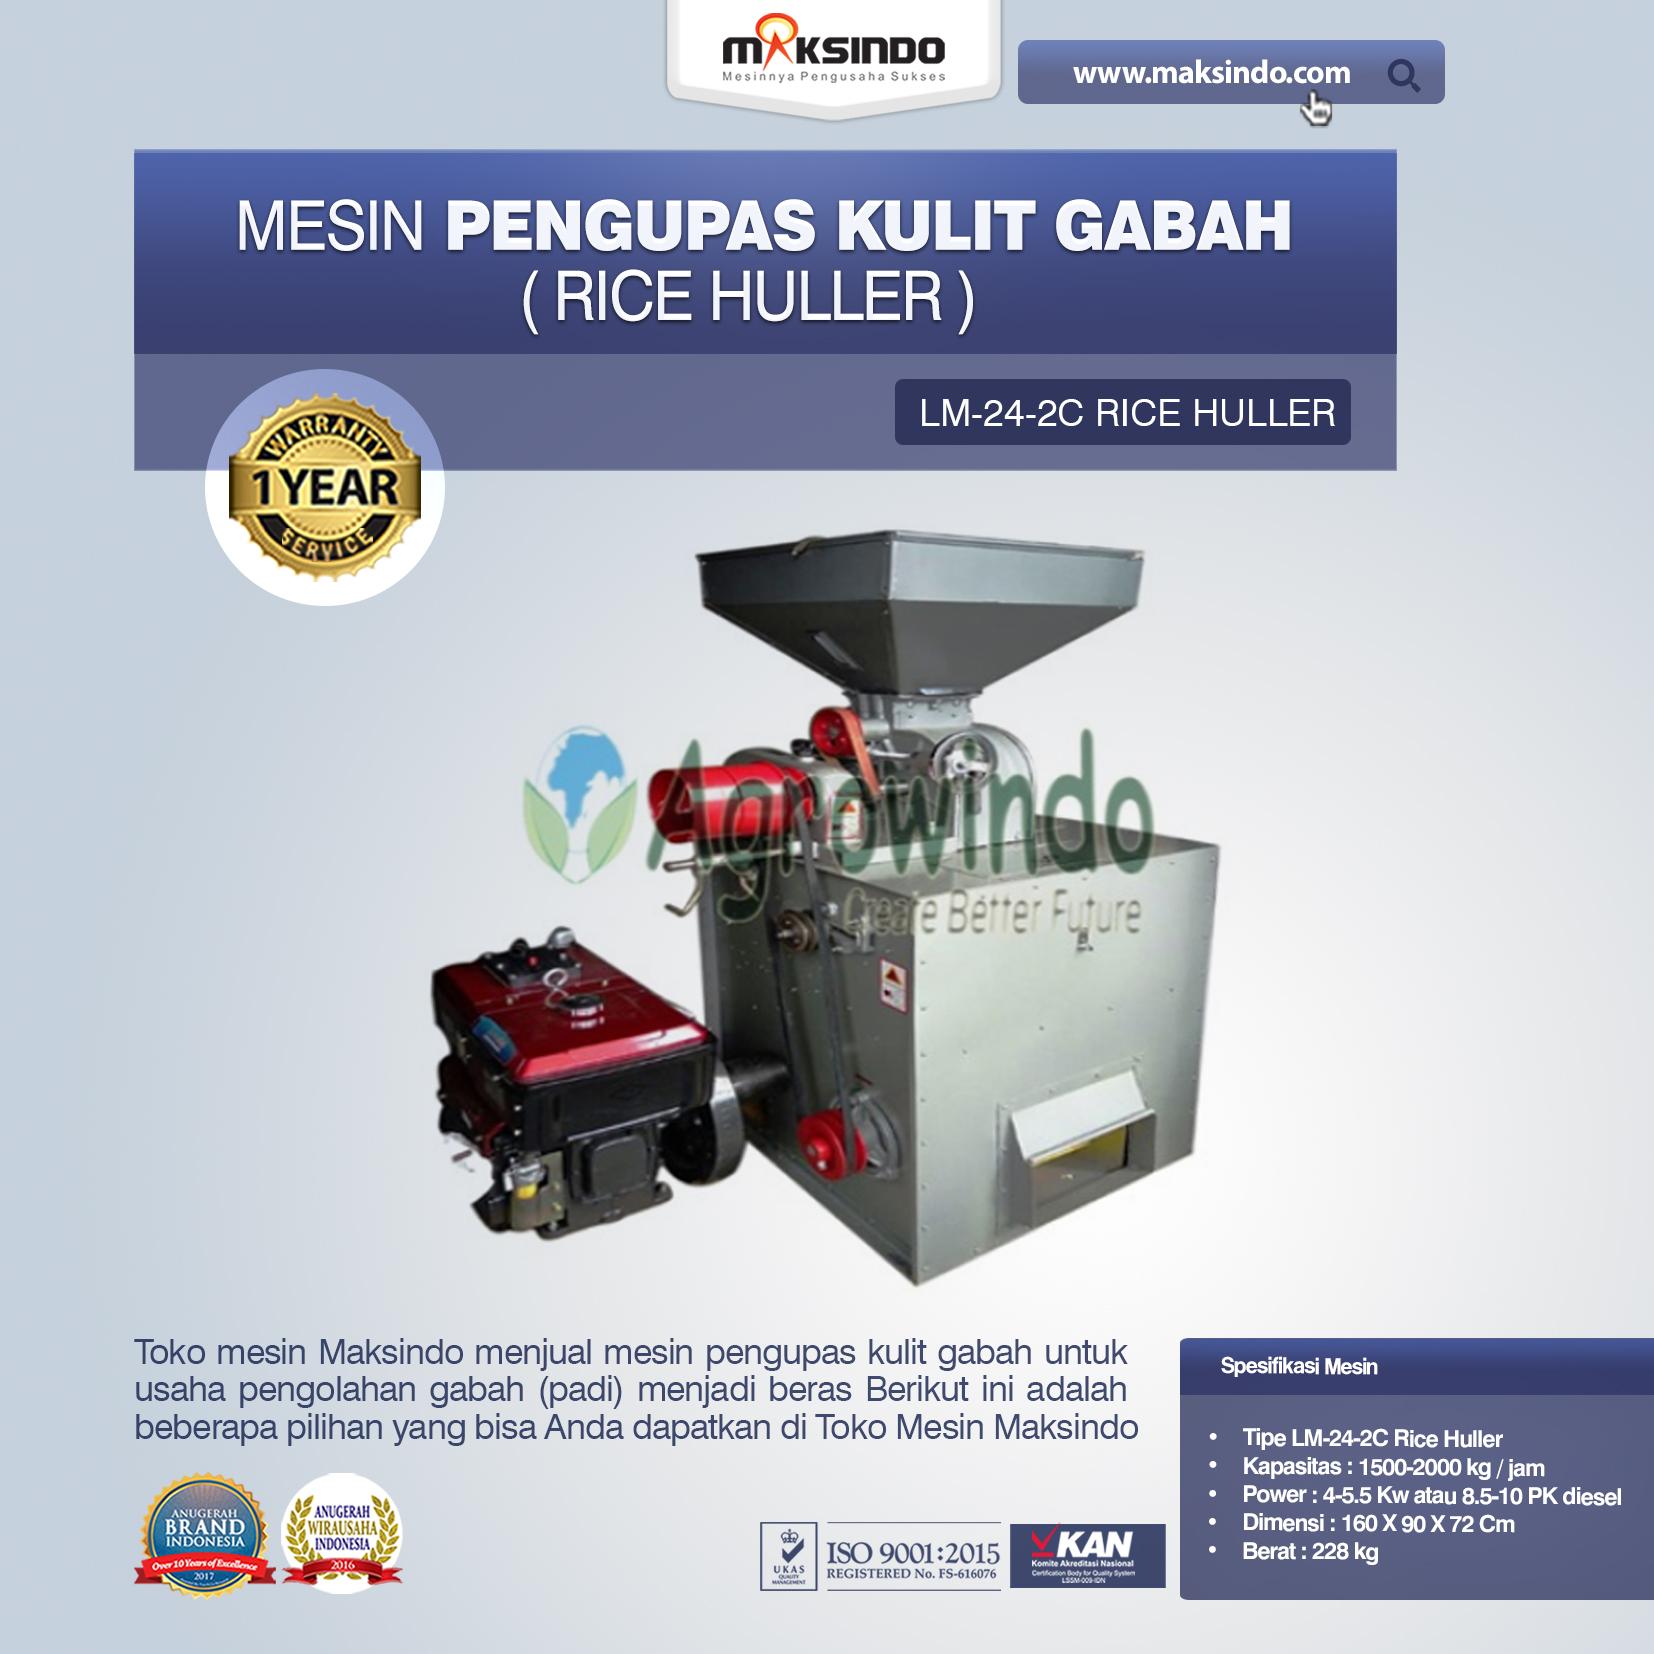 Jual Mesin Pengupas Kulit Gabah (rice huller) di Tangerang